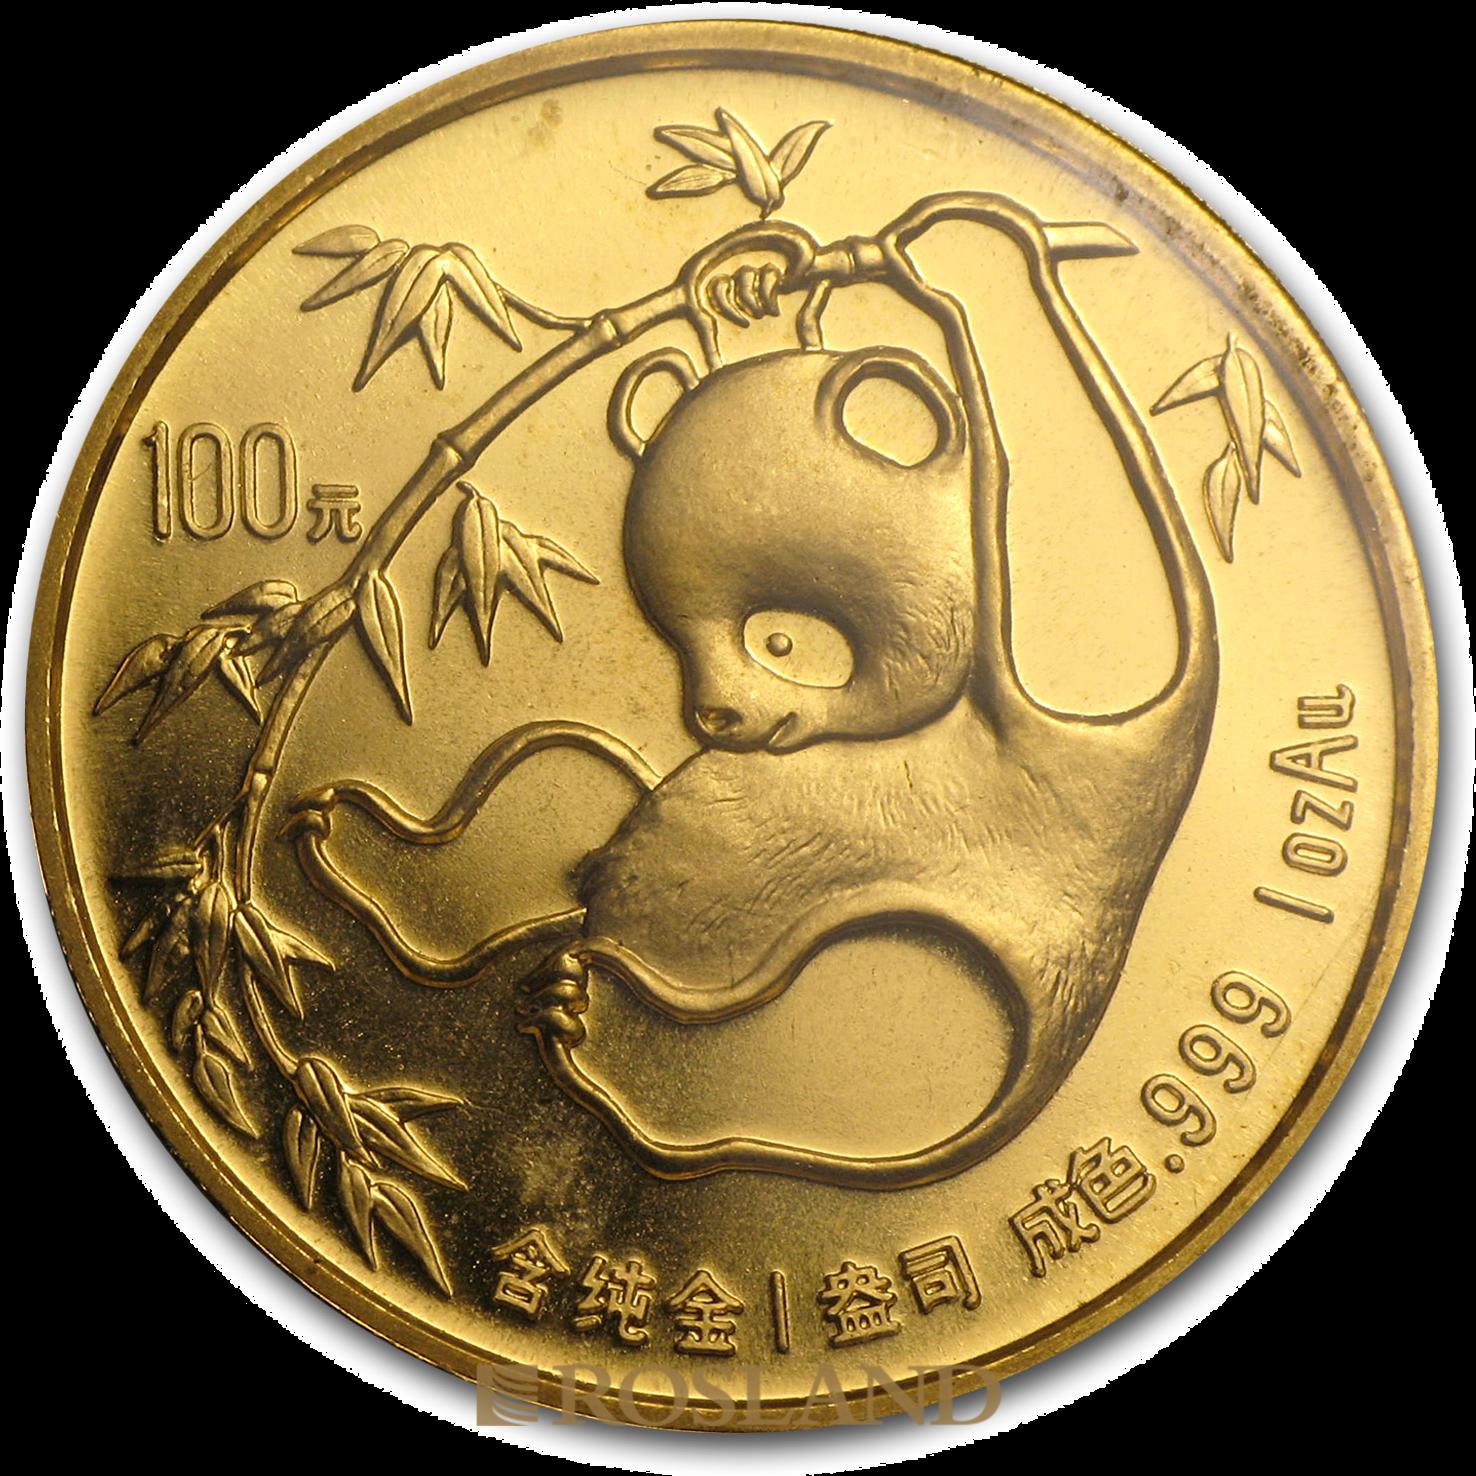 1 Unze Goldmünze China Panda 1985